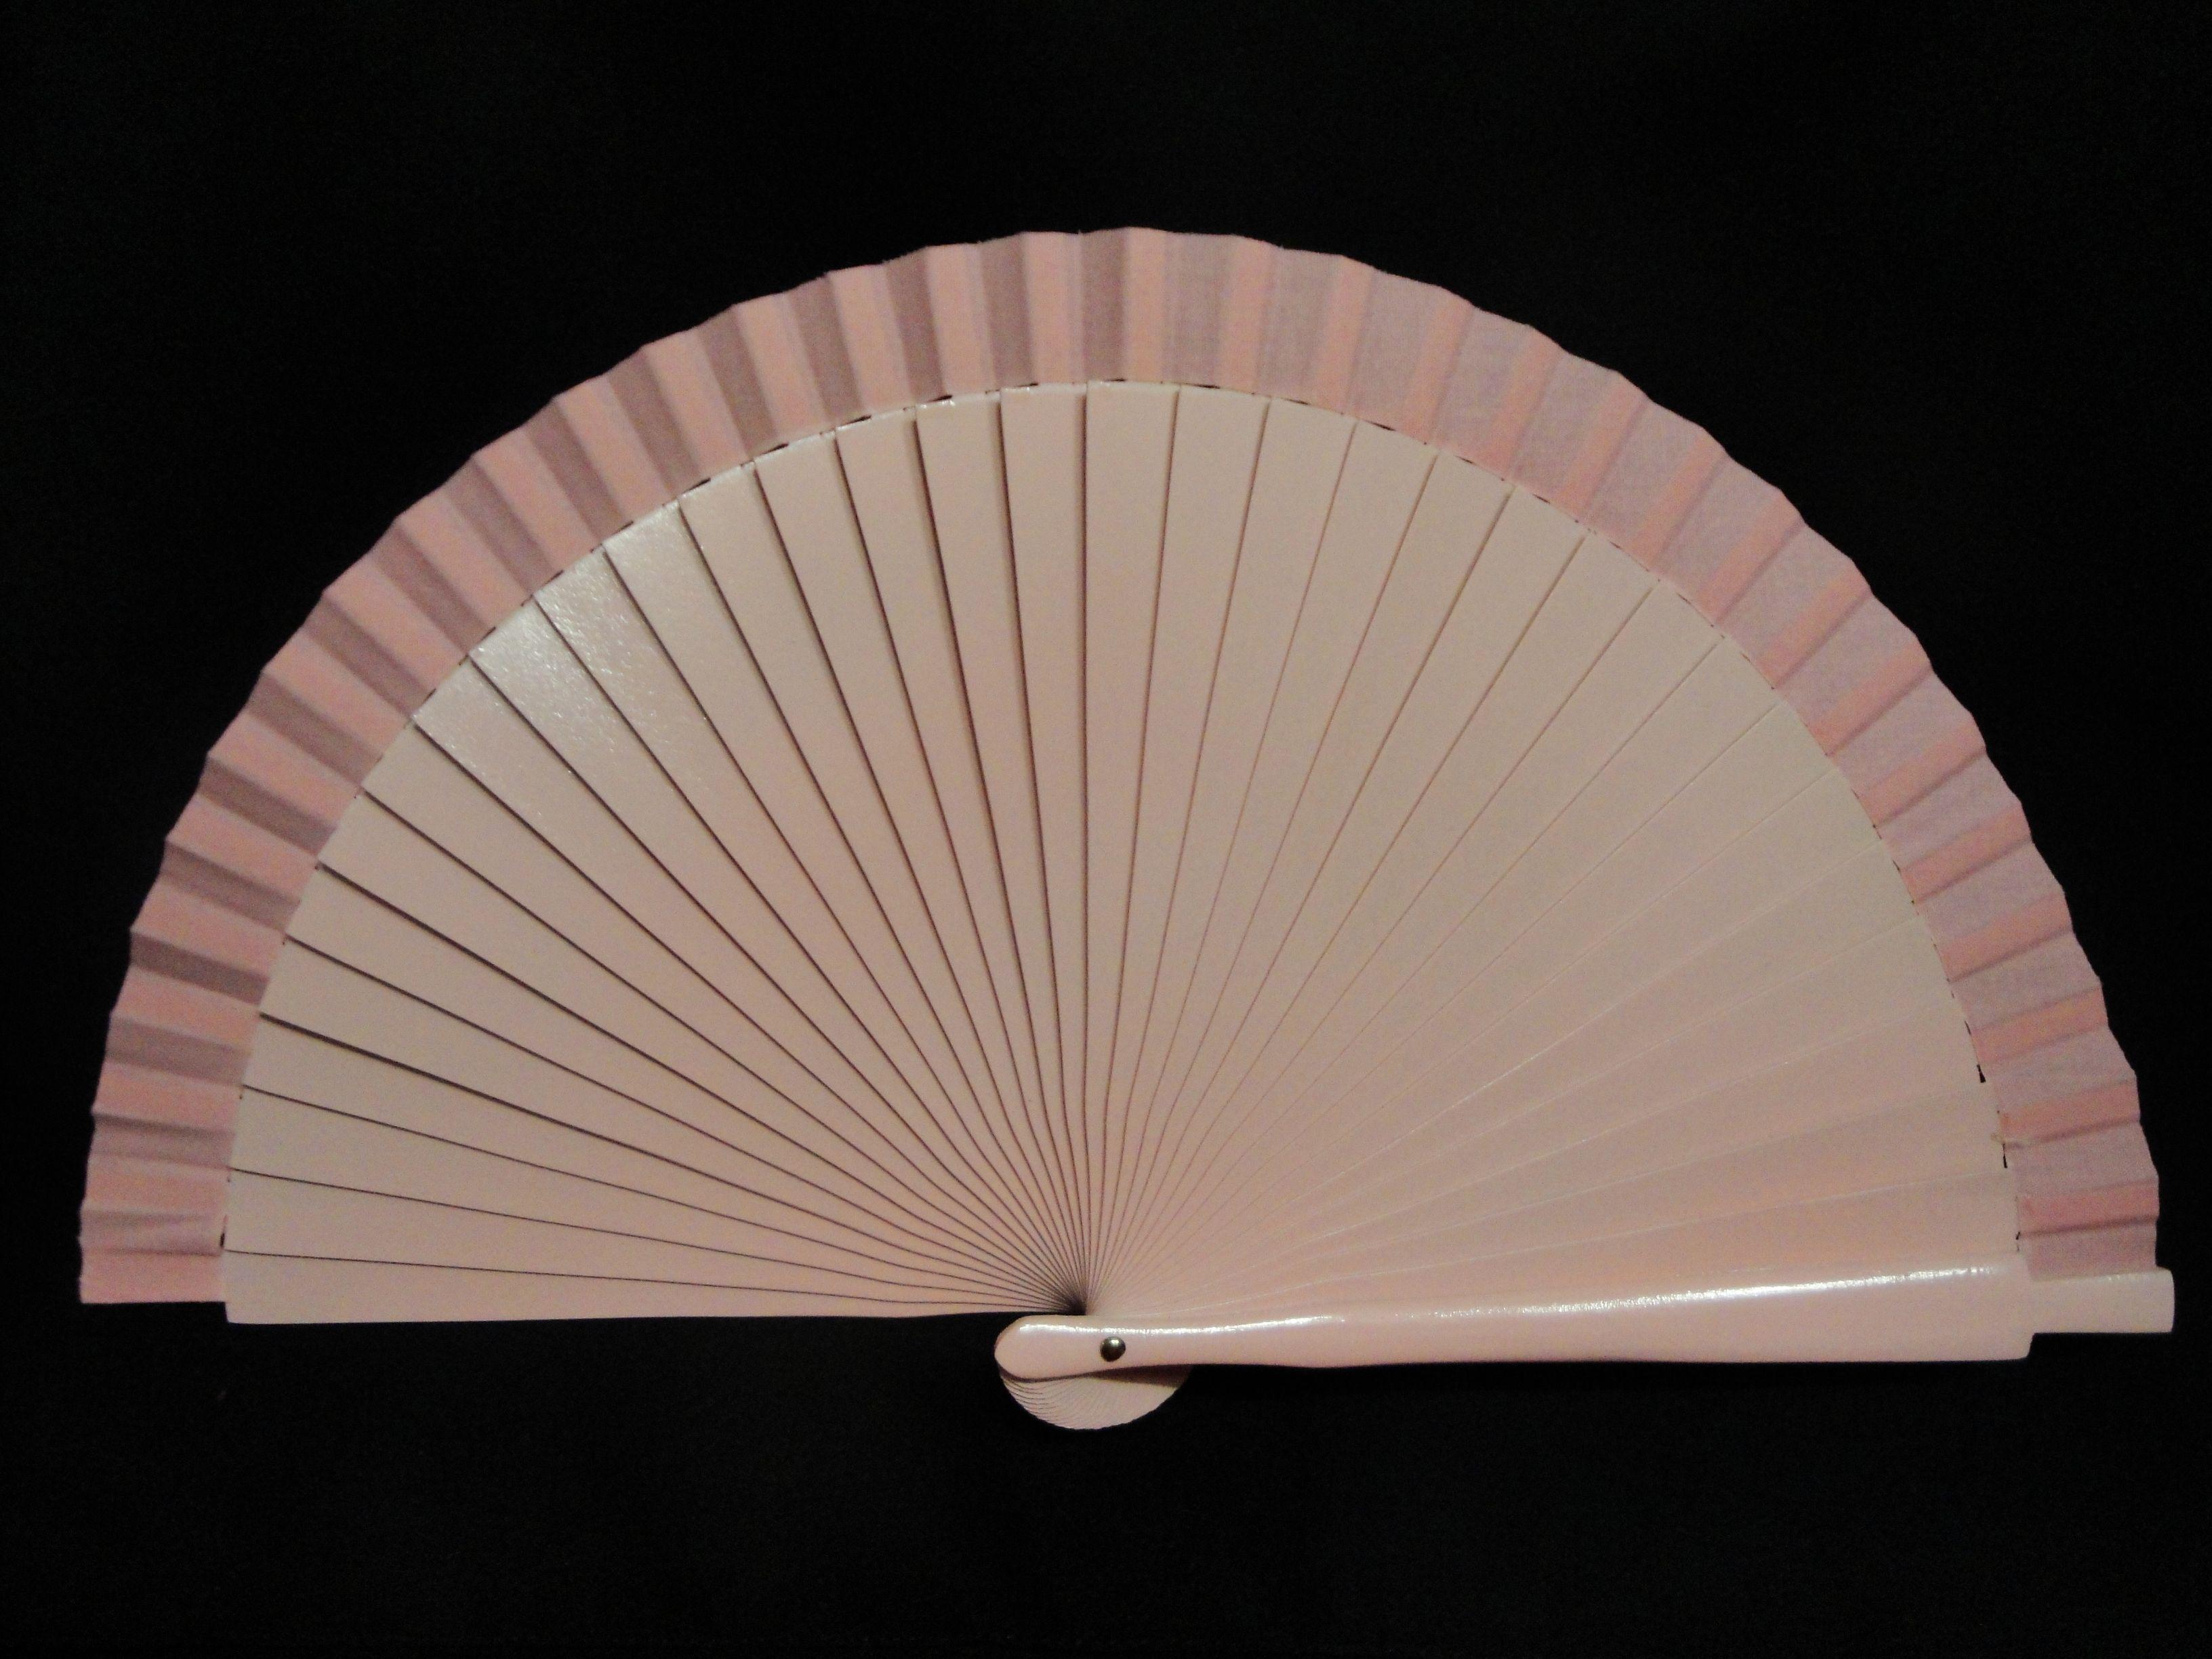 Abanico de madera liso. Color: Rosa. Medida: 23 cm.